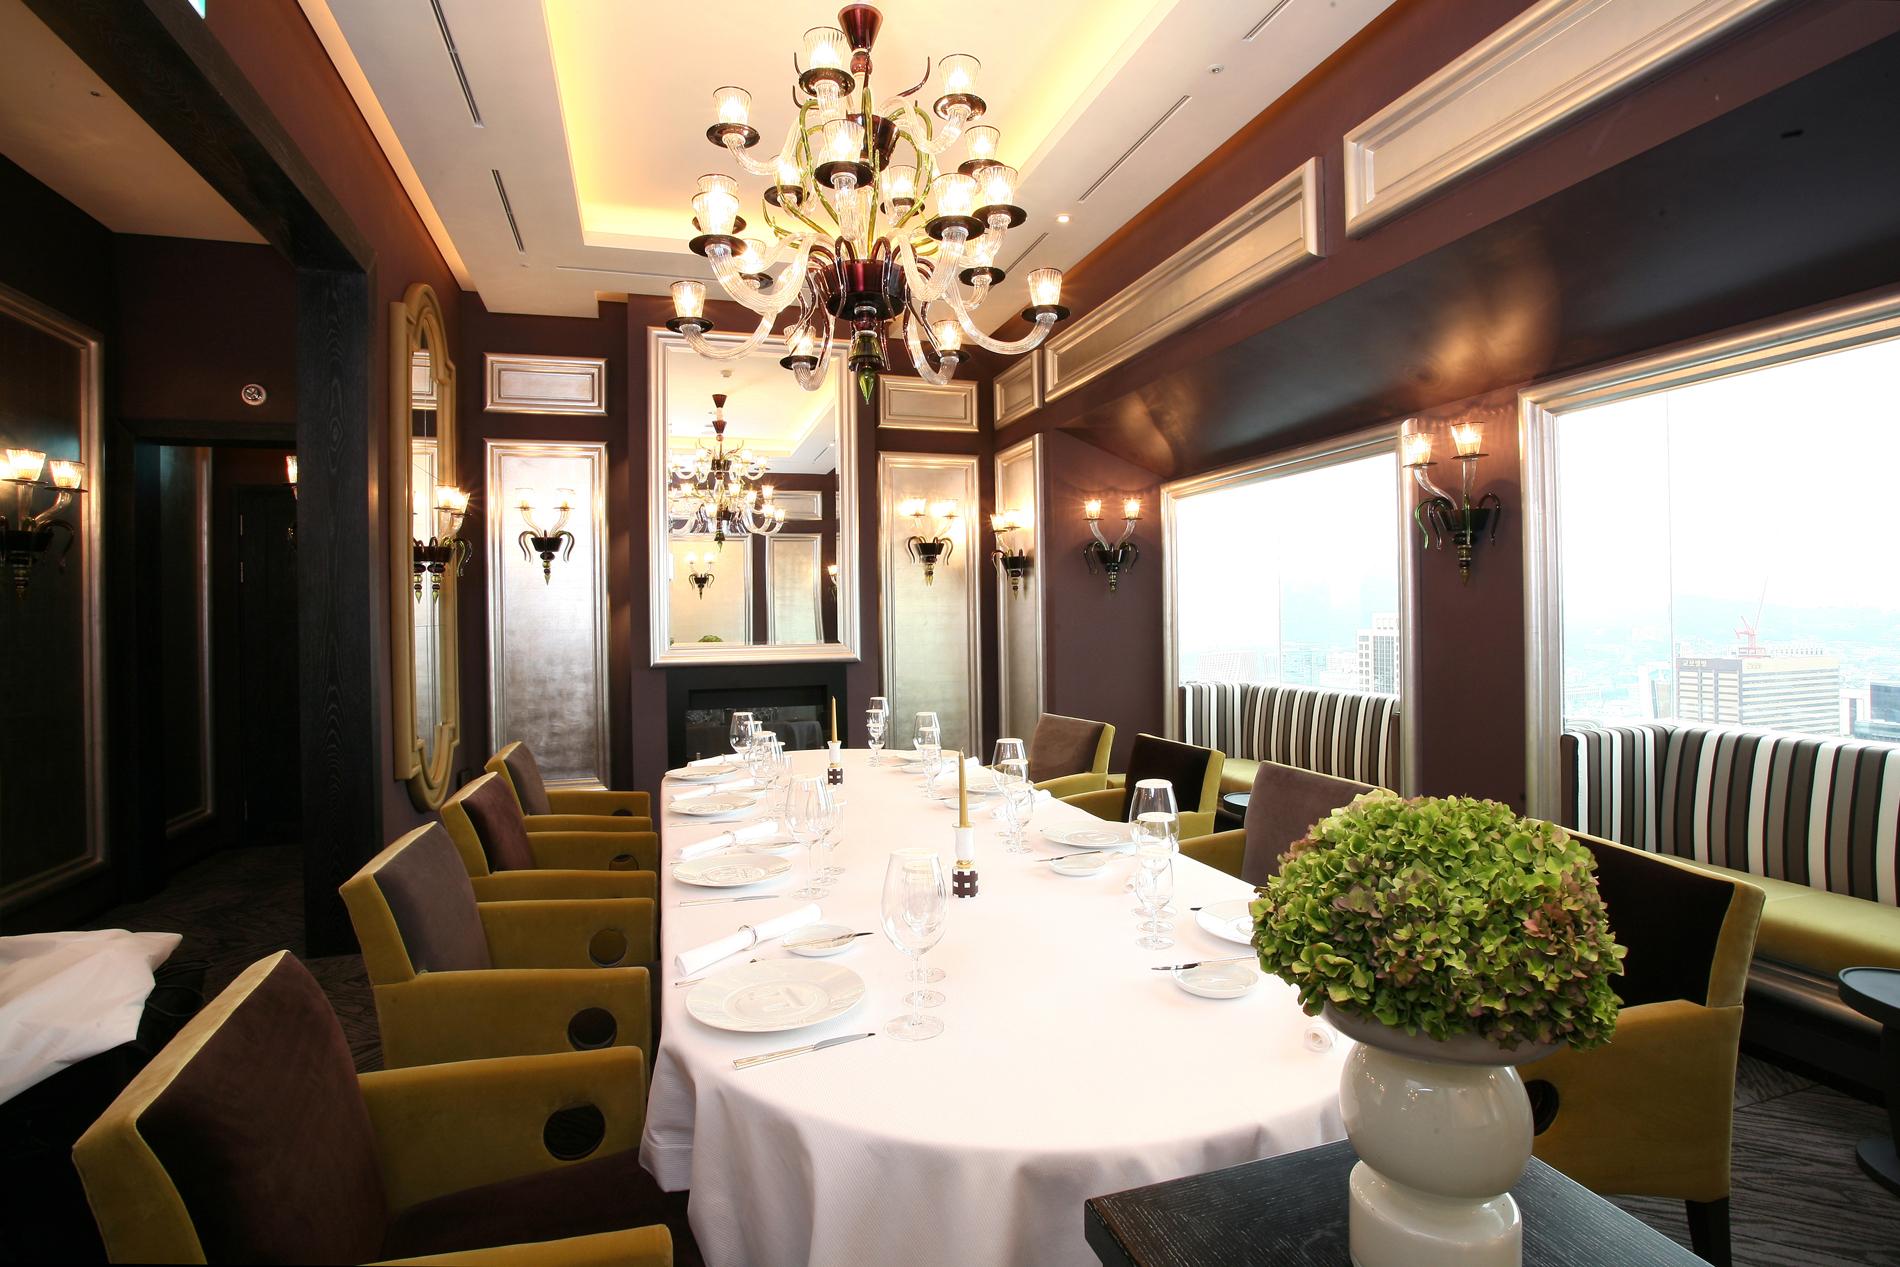 pierre-gagnaire-restaurant-seoul-olivier-gagnere-veronese-3